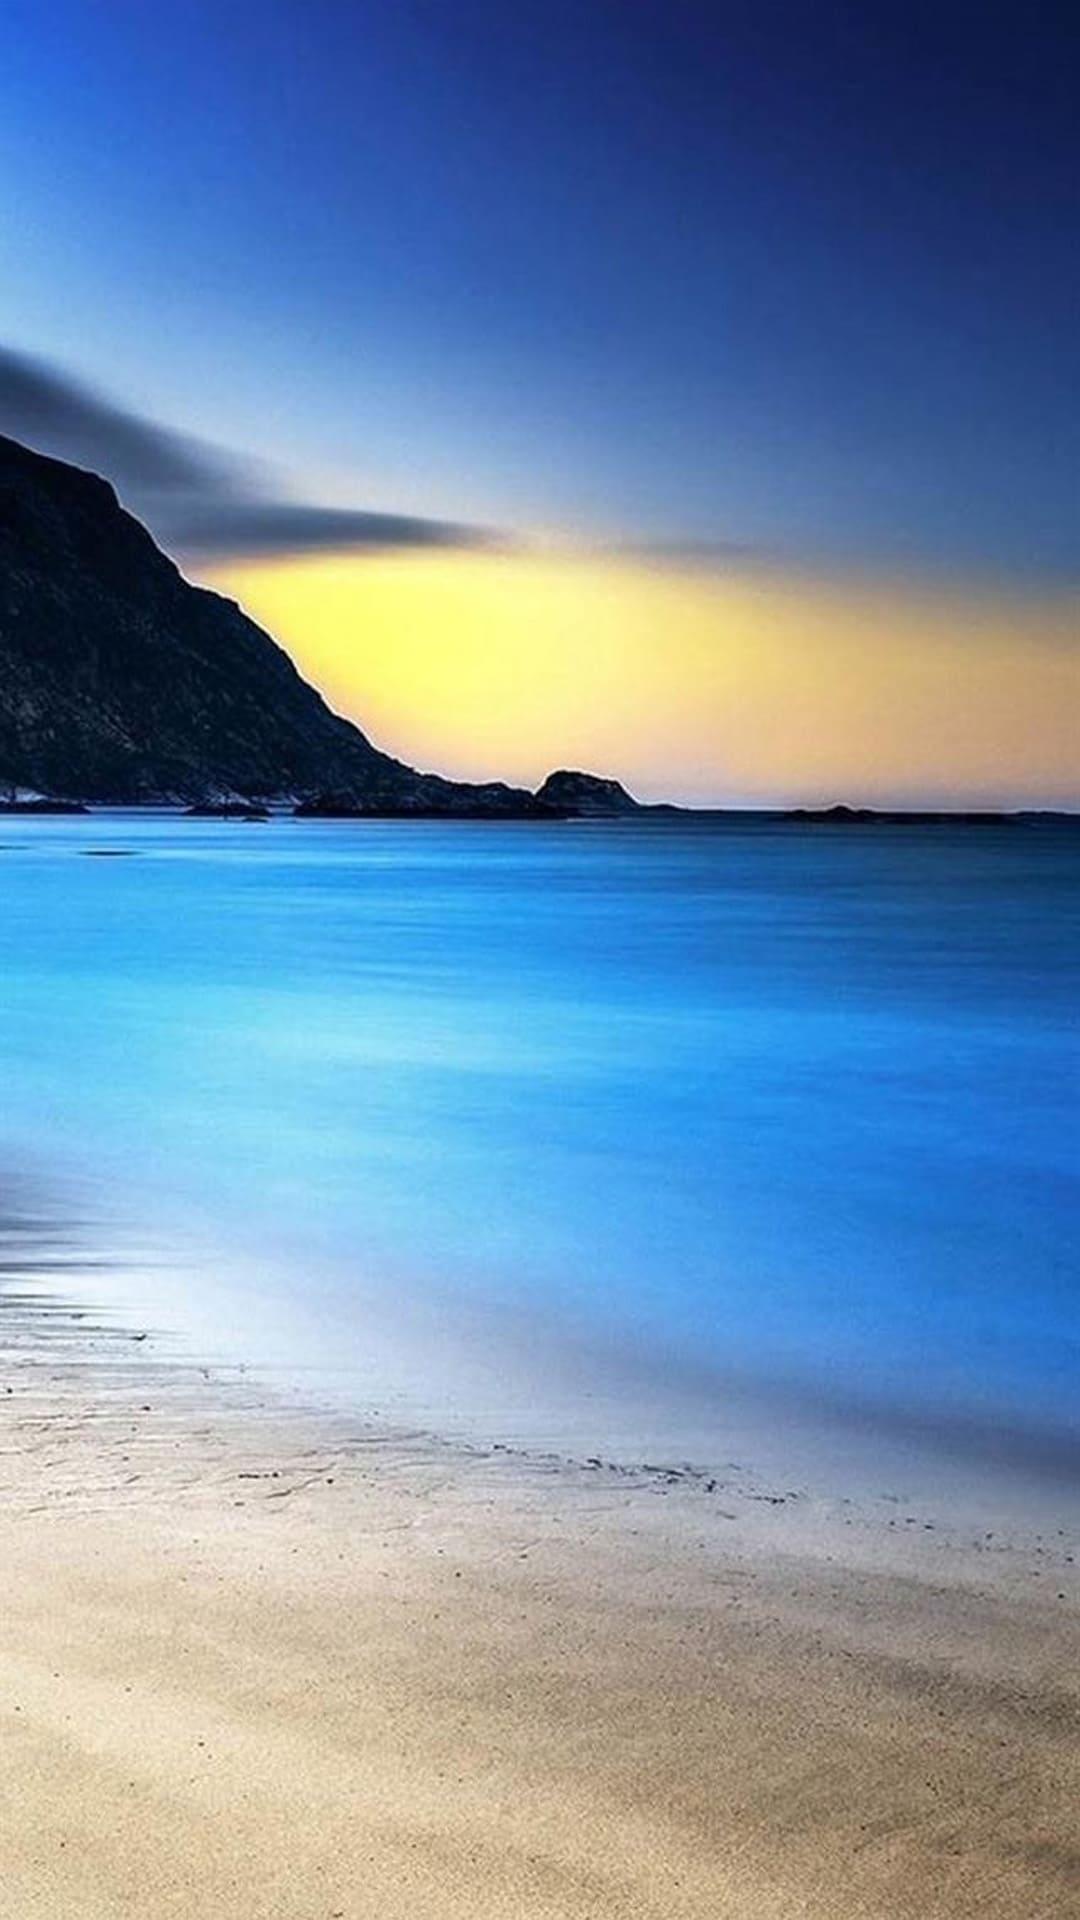 обои на айфон пляж море